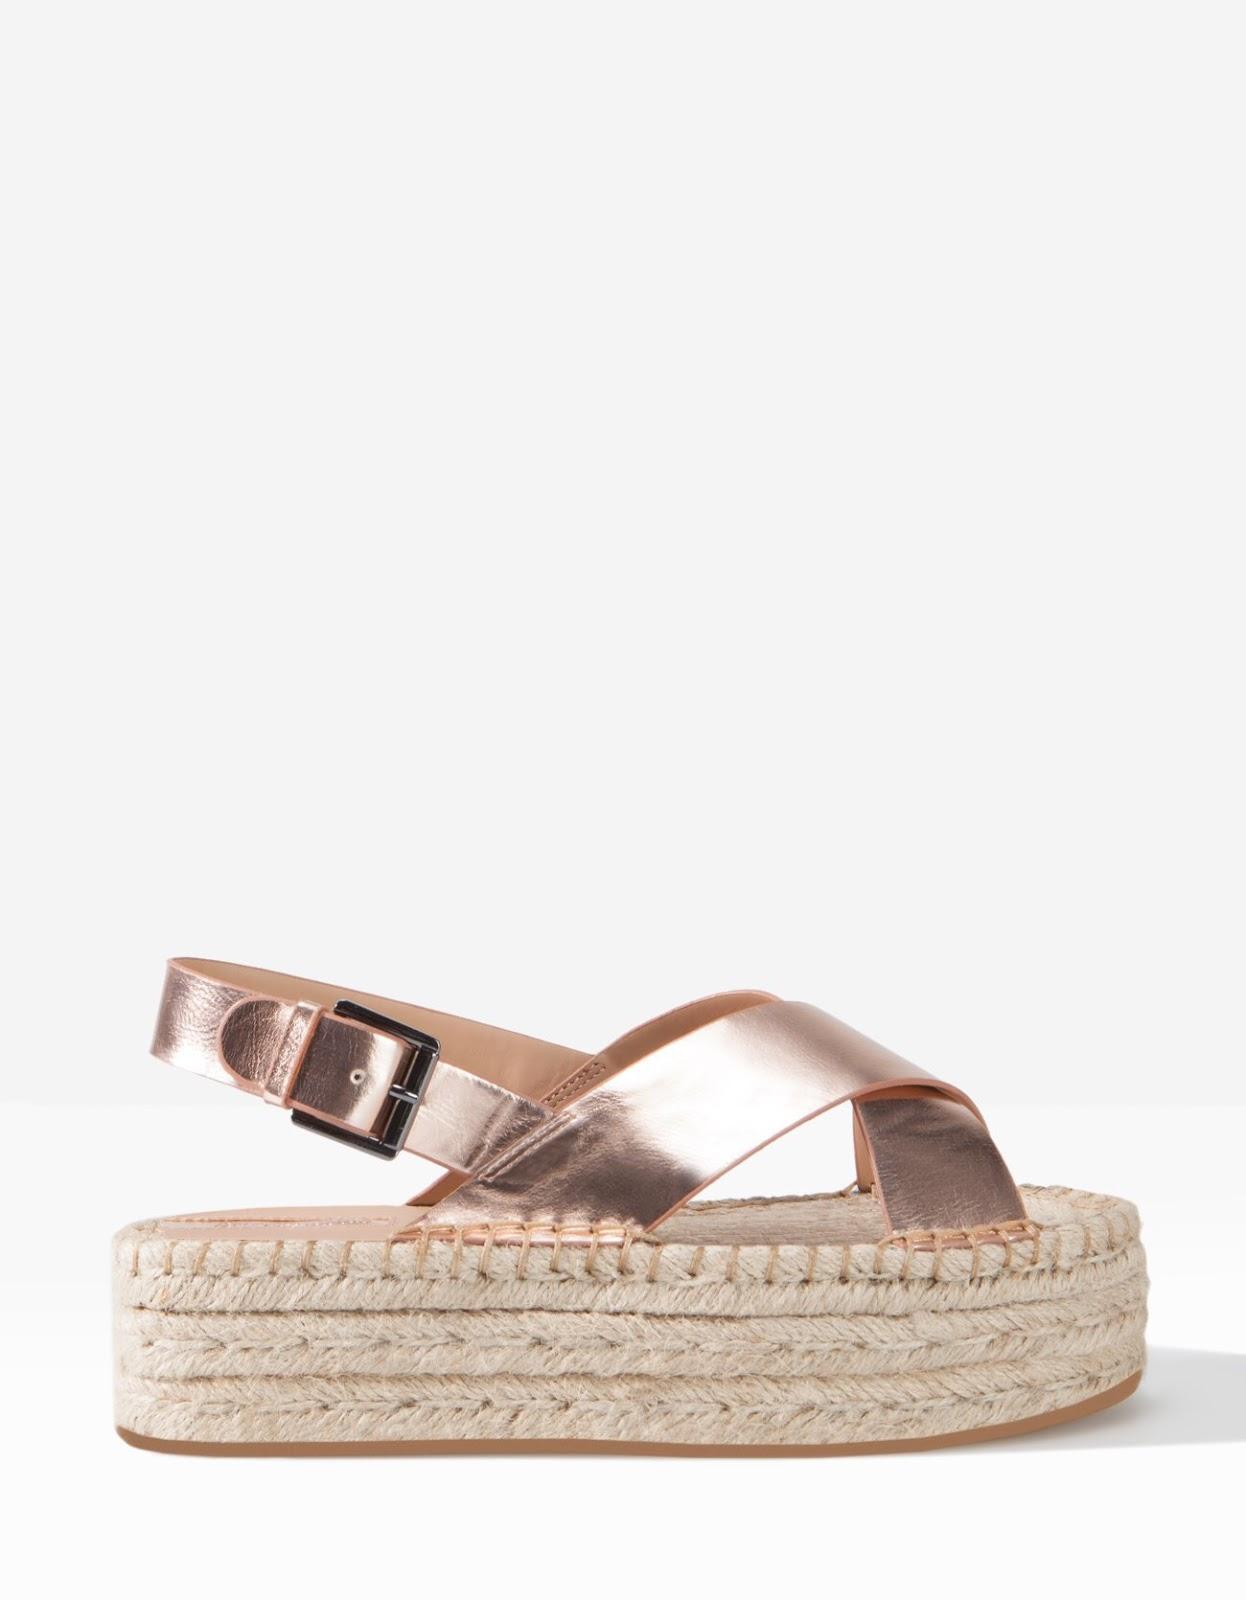 Top_zapatos_para_este_verano_2015_The_Pink_Graff_02